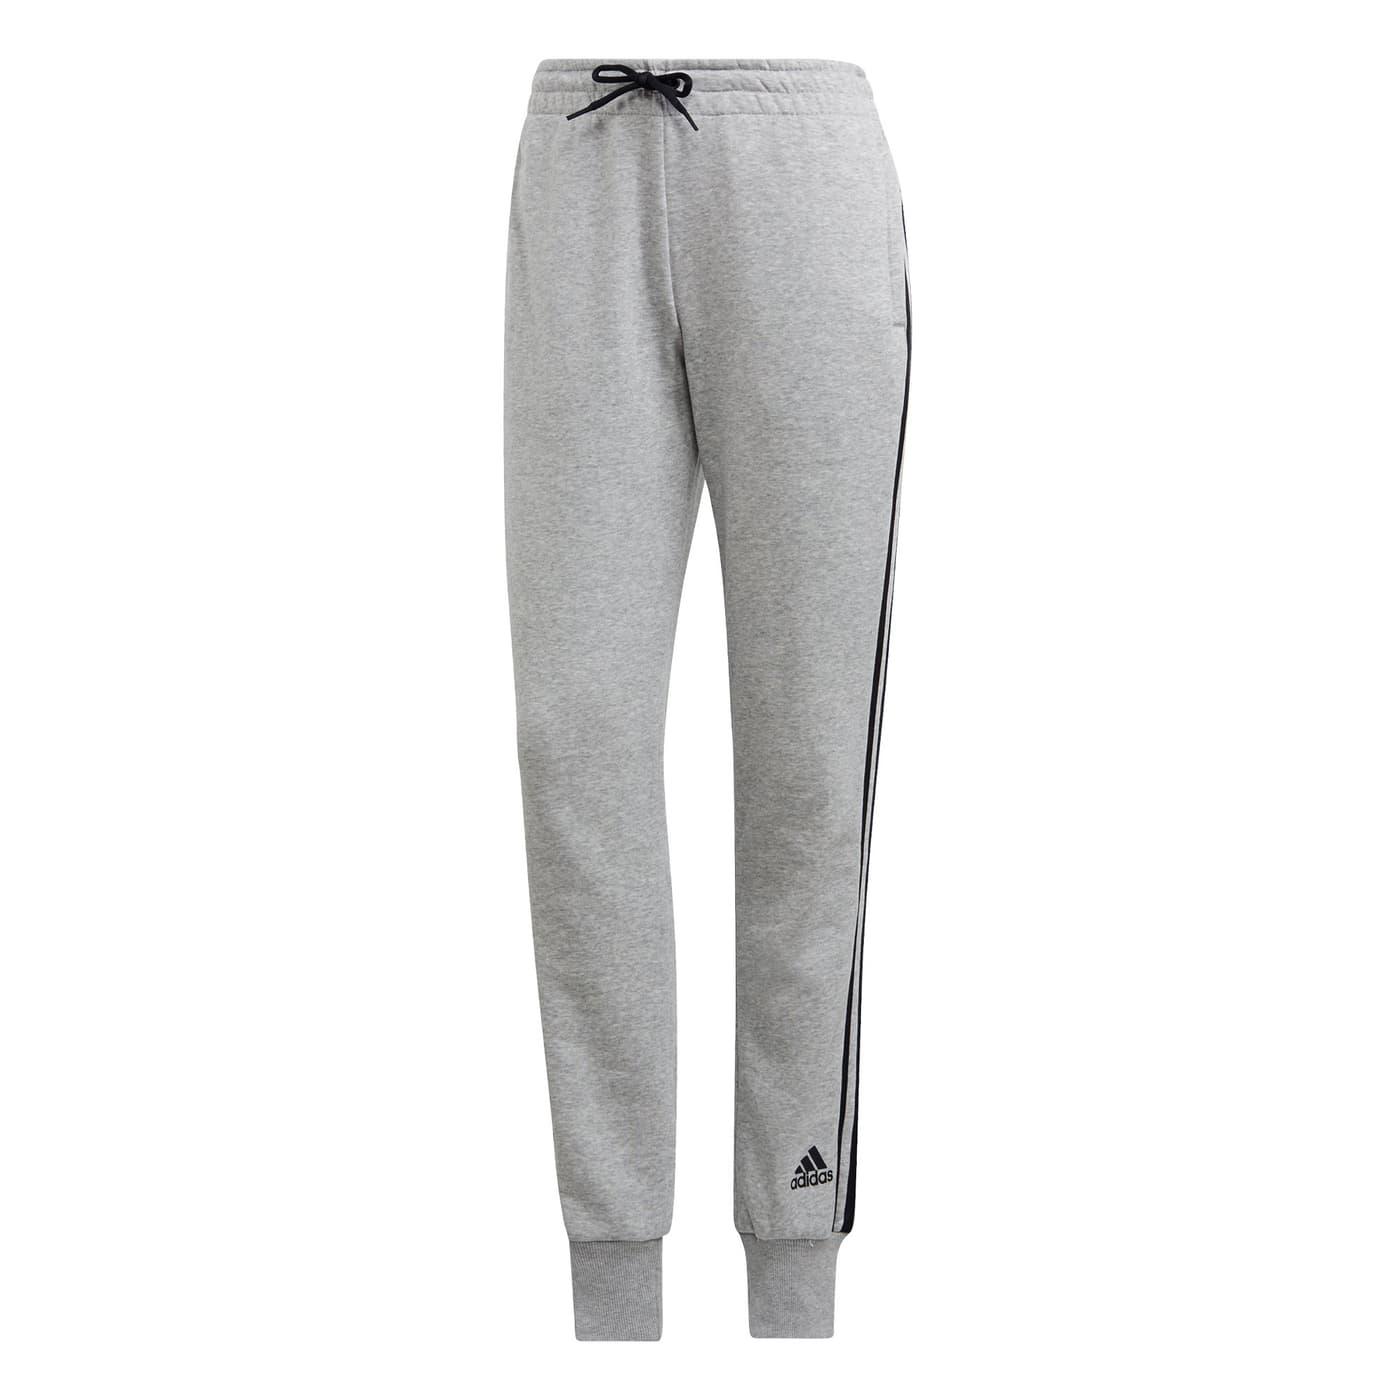 pantaloni jeans adidas